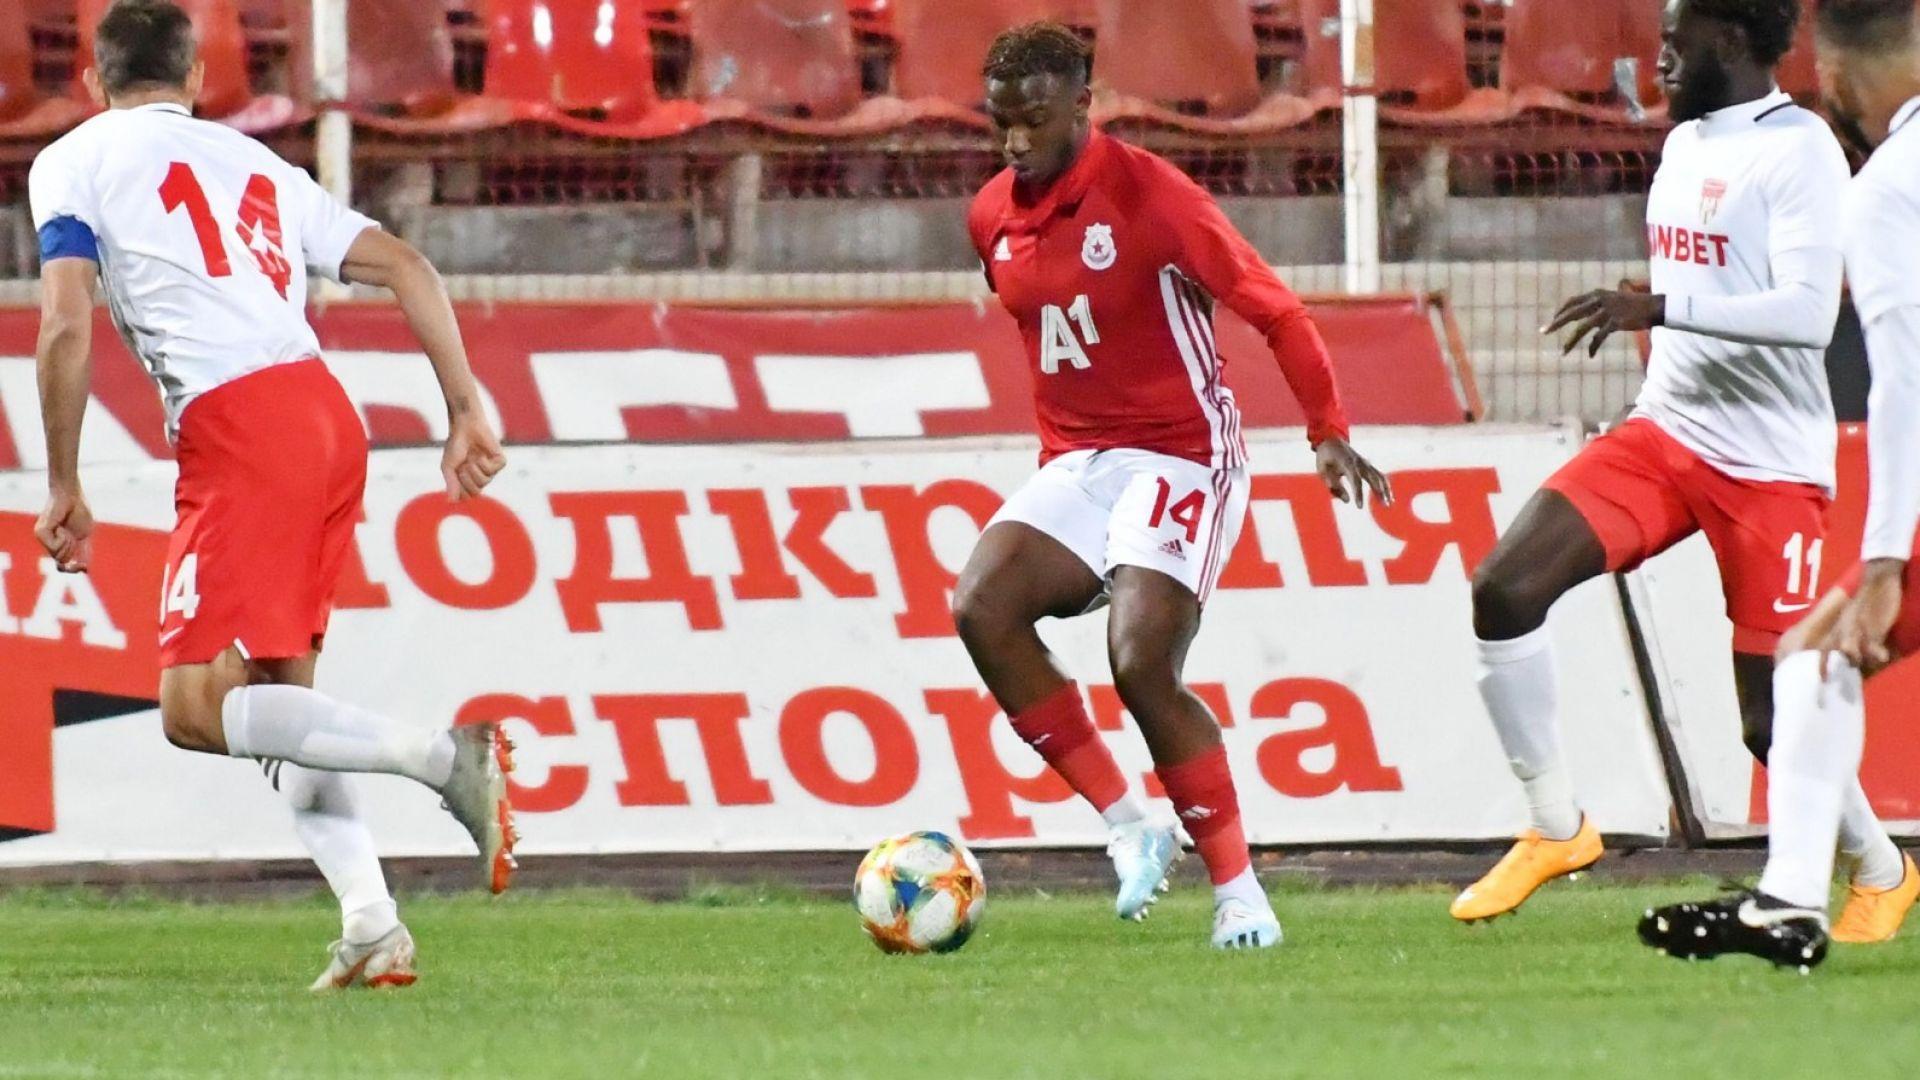 Вив Соломон-Отабор пред Winbet: Ще победим Славия с 3:0